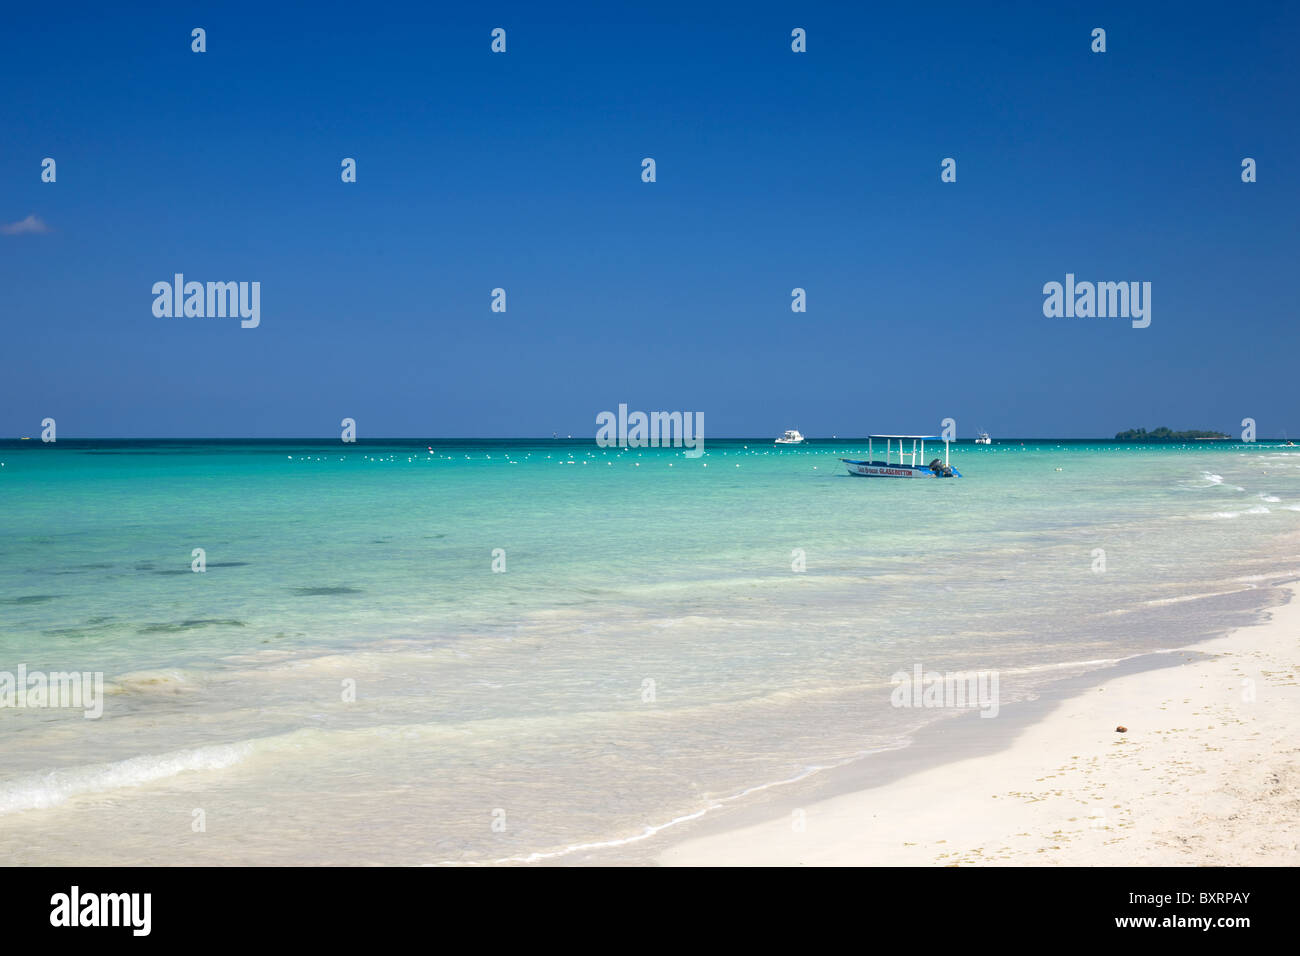 Jamaica, Negril, Seven mile Beach - Stock Image